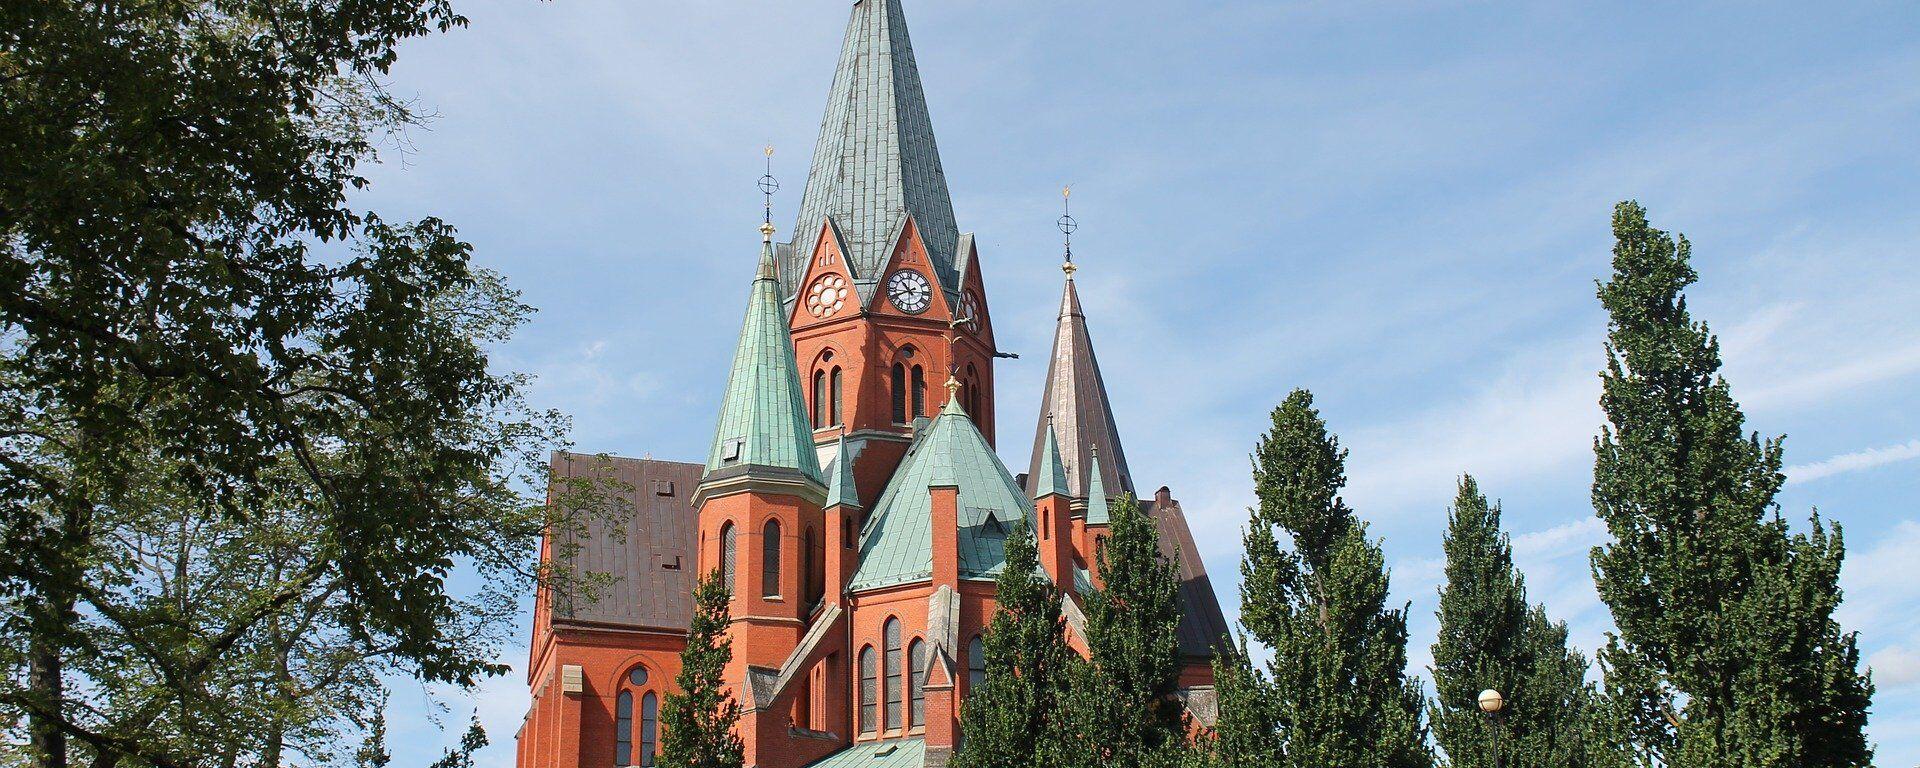 Church in Sweden - Sputnik International, 1920, 02.09.2021